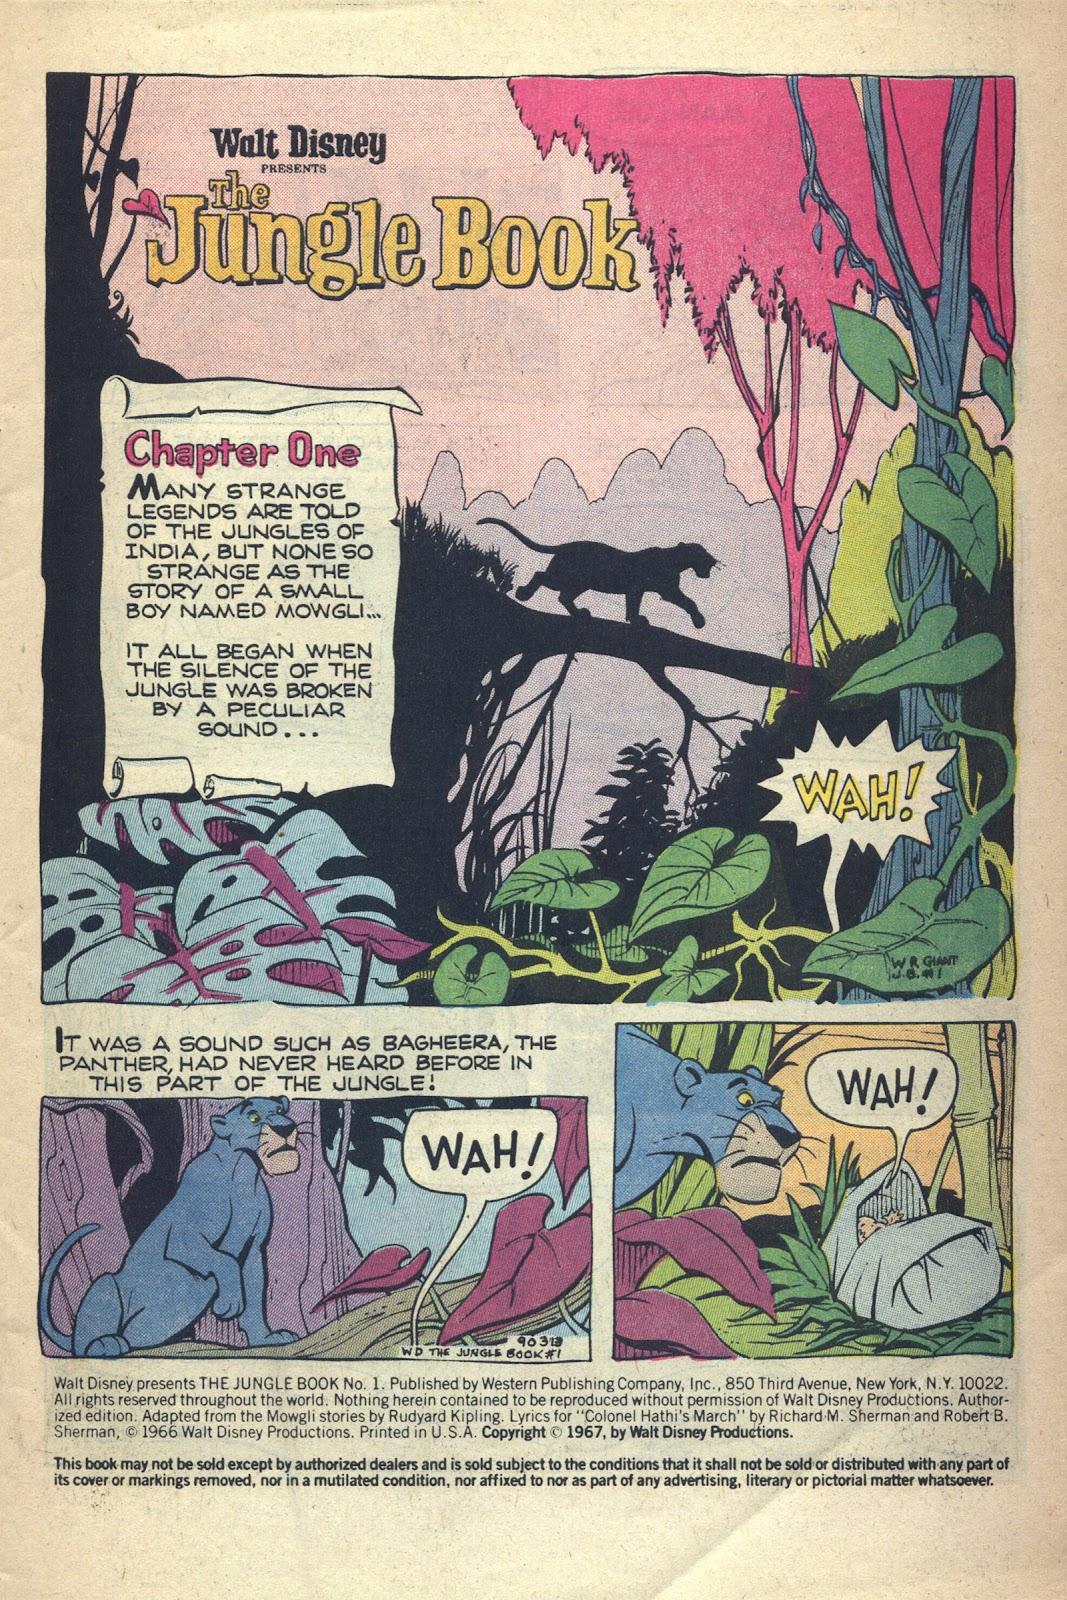 Read online Walt Disney presents The Jungle Book comic -  Issue # Full - 3